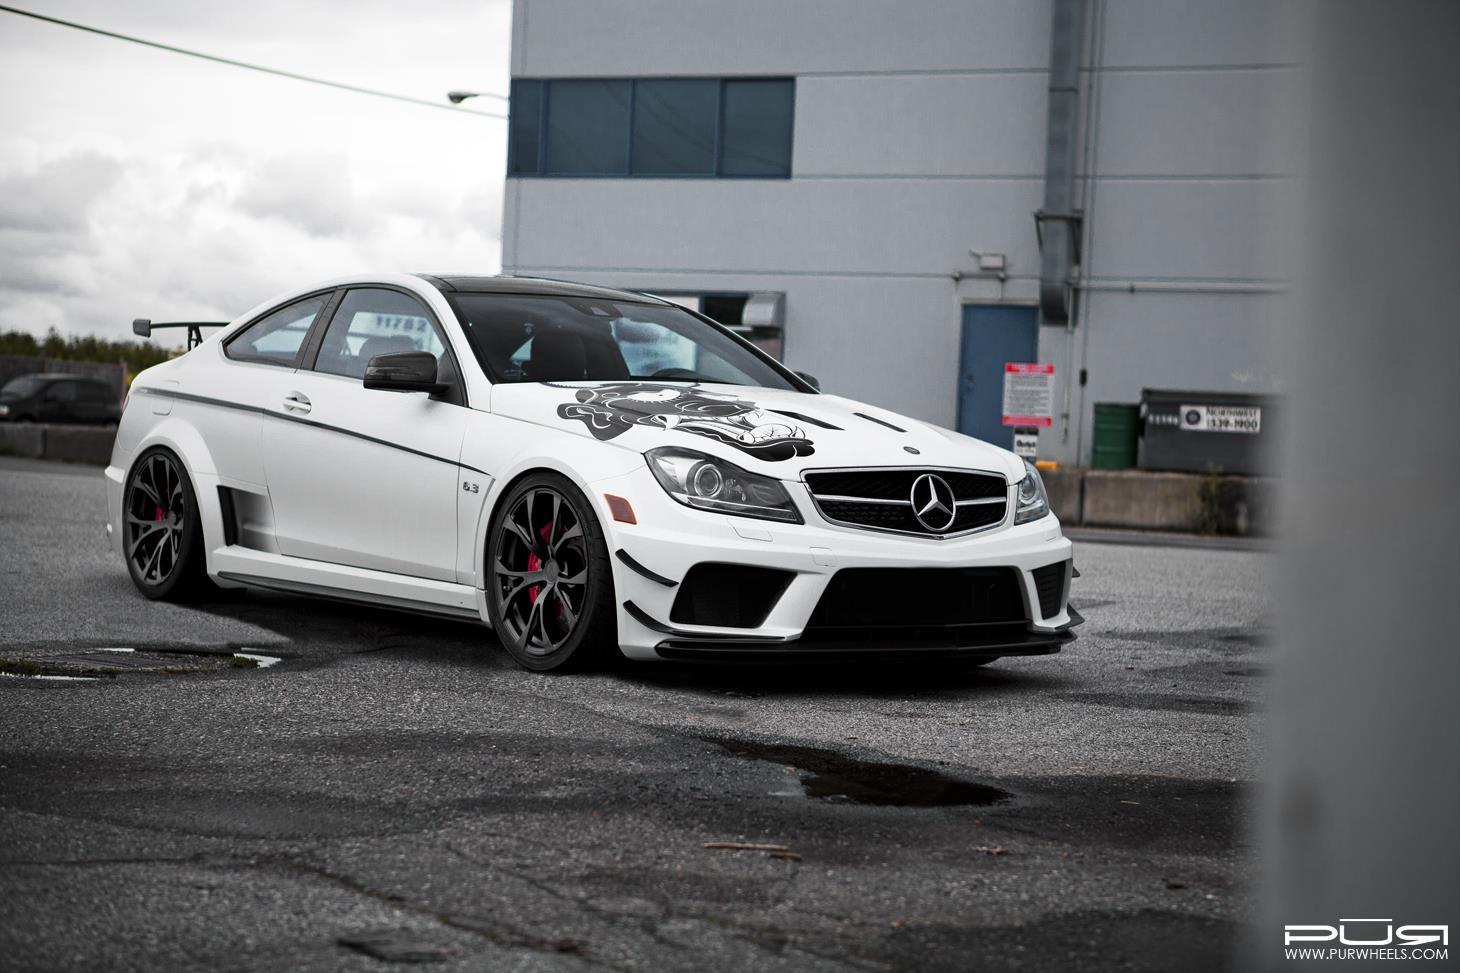 All Types amg black series wheels : Barbaric Mercedes-Benz C63 AMG Black Series Lowered on PUR Wheels ...